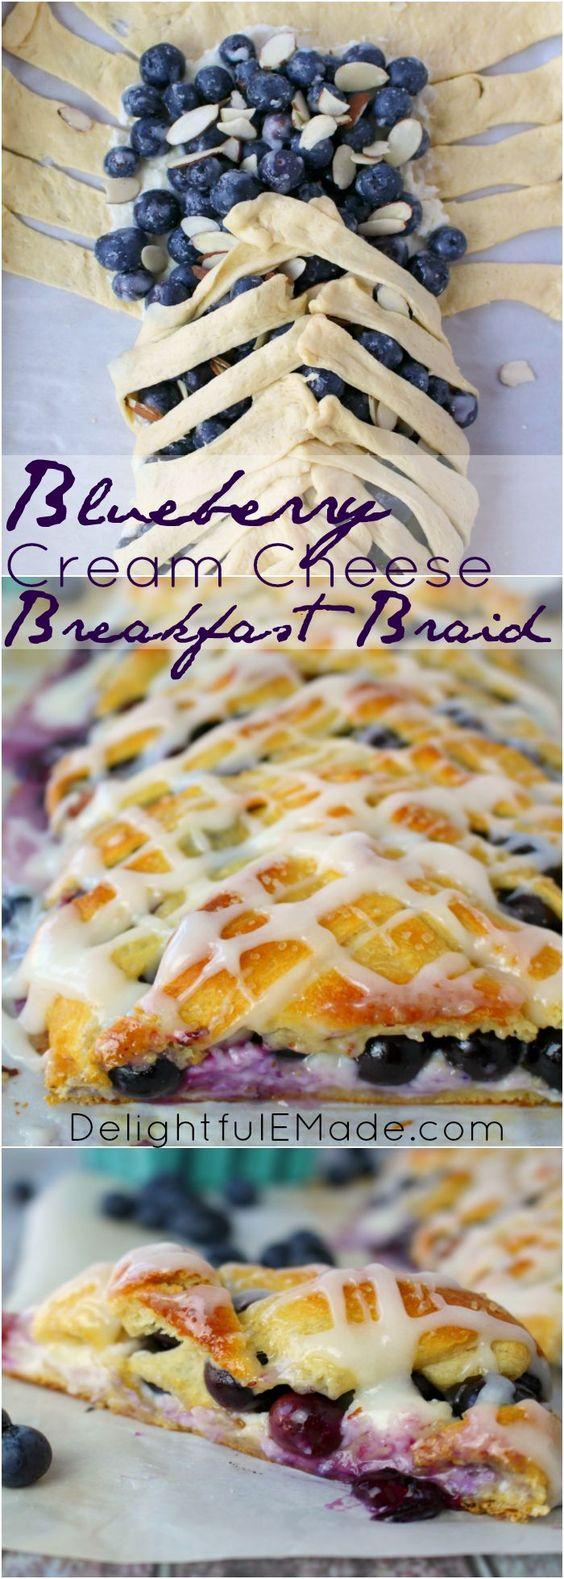 BLUEBERRY CREAM CHEESE BREAKFAST BRAID